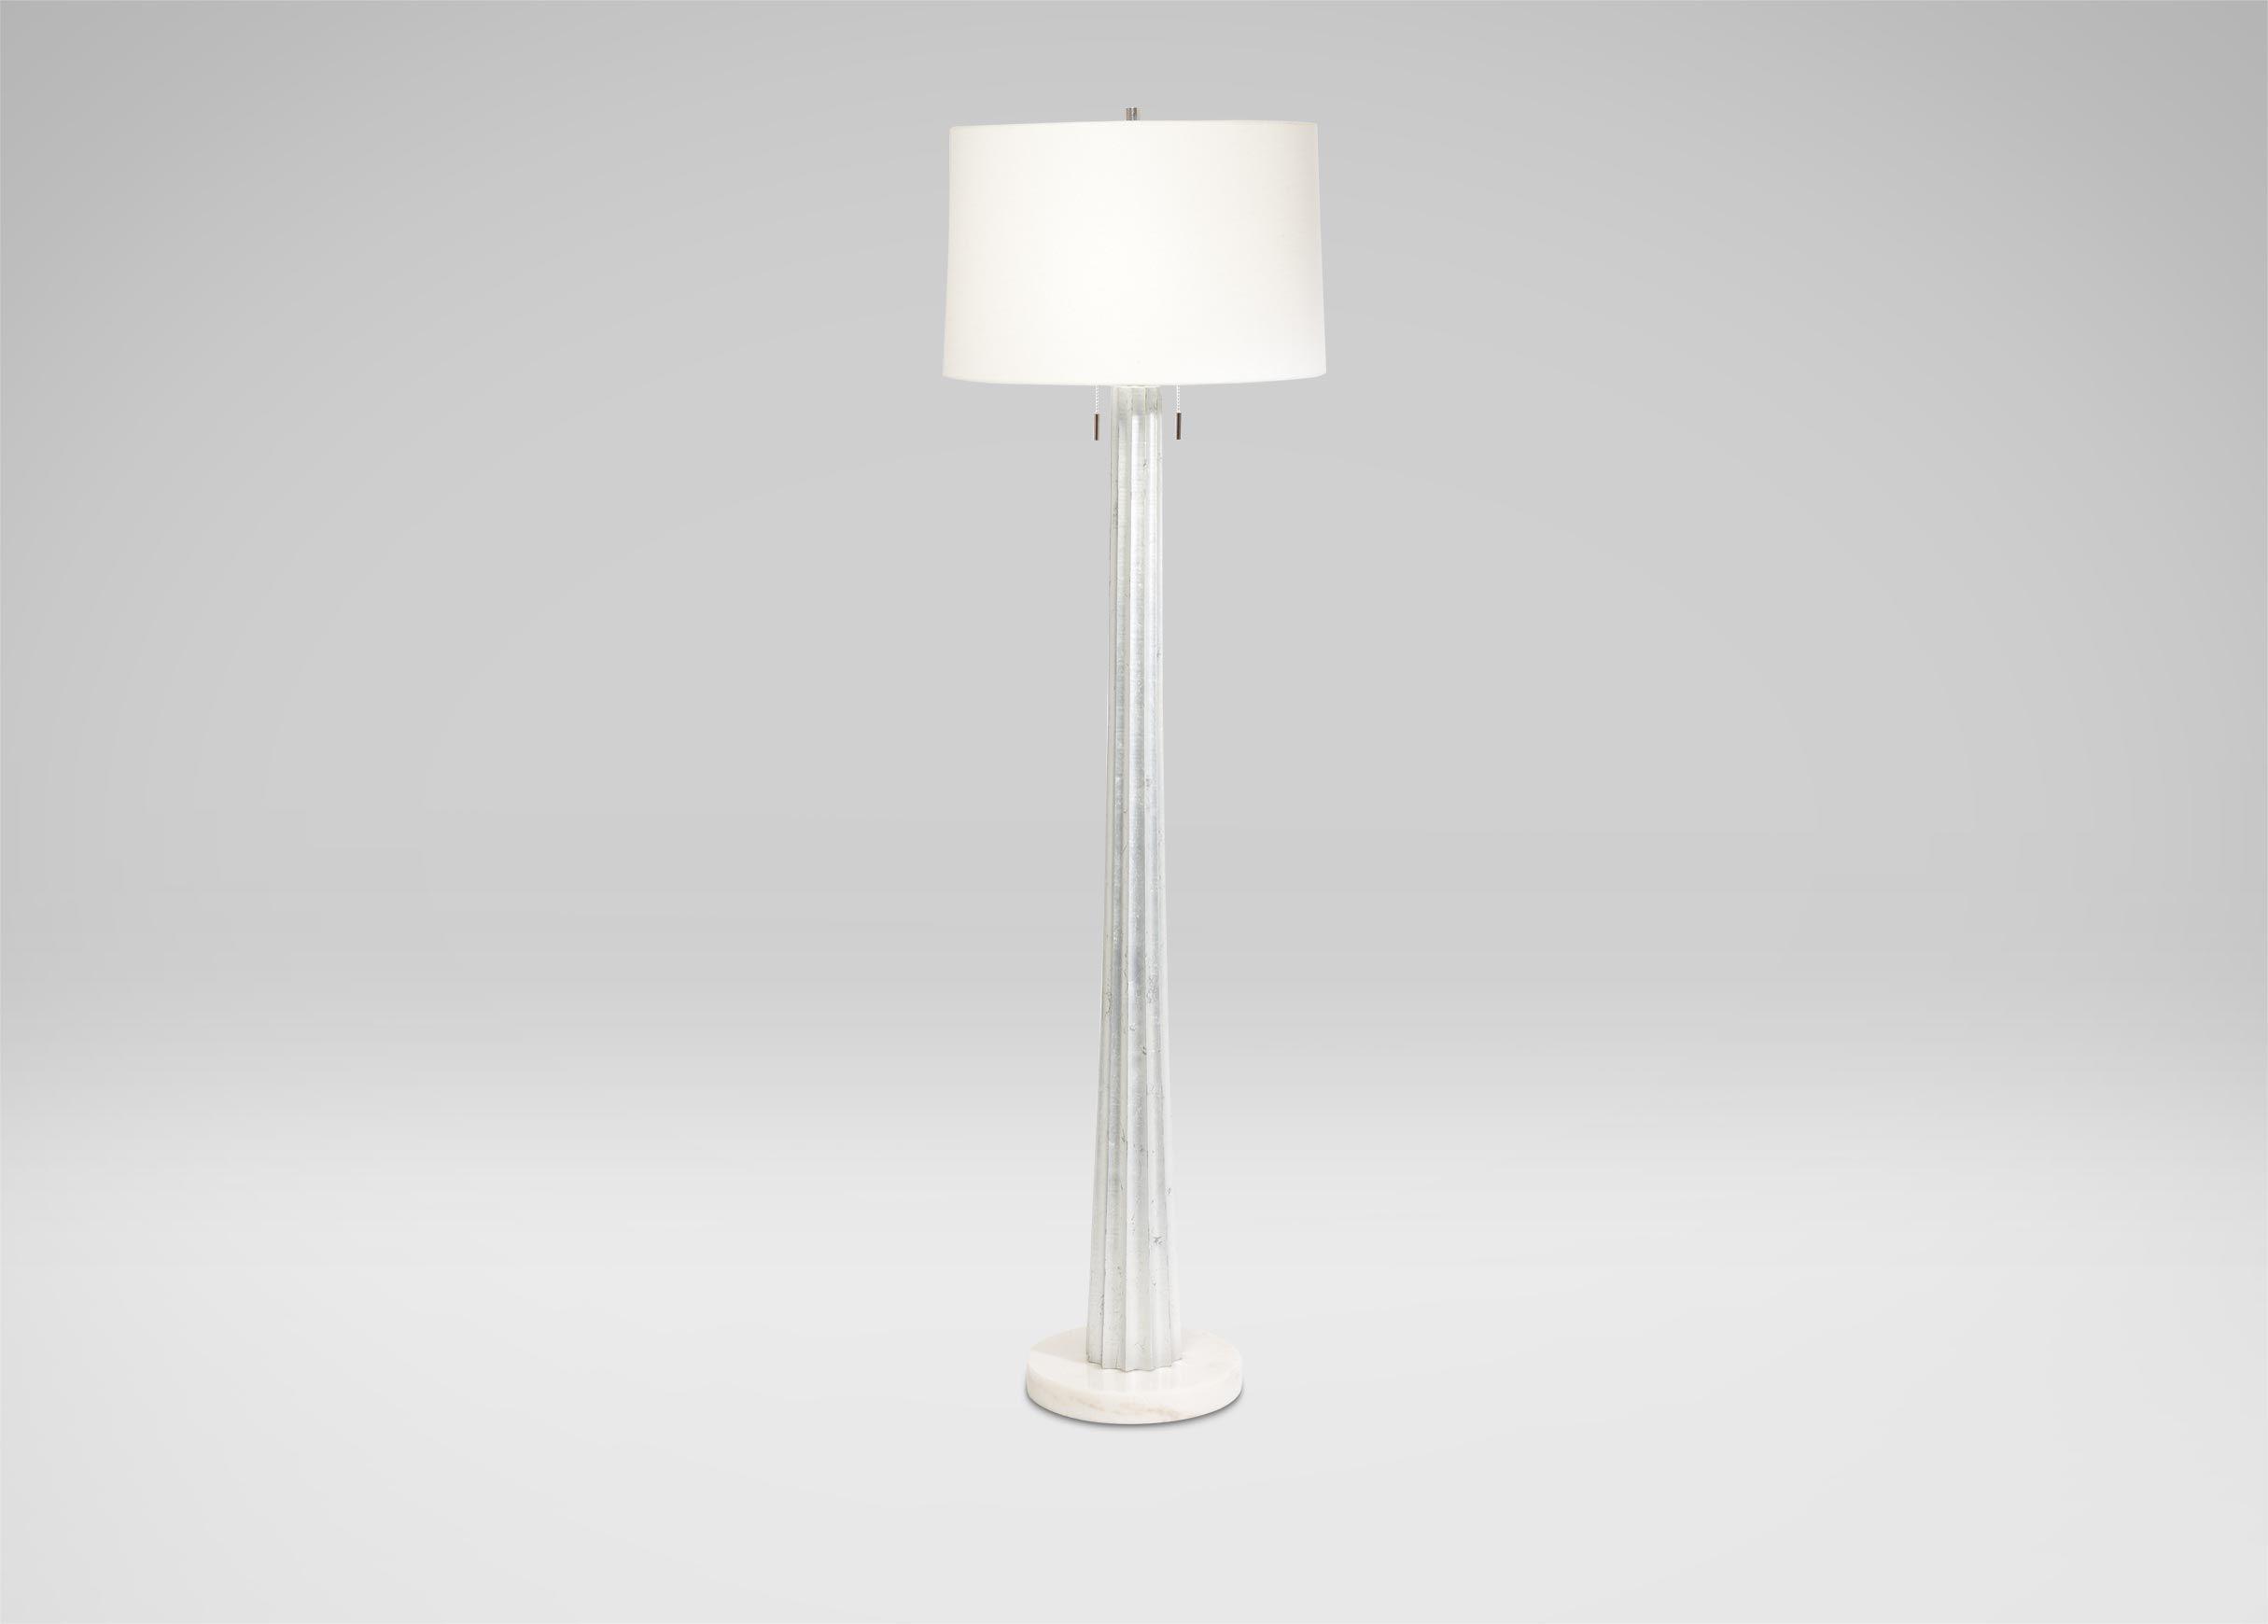 Silver melrose floor lamp highland oaks lighting pillows art silver melrose floor lamp aloadofball Gallery